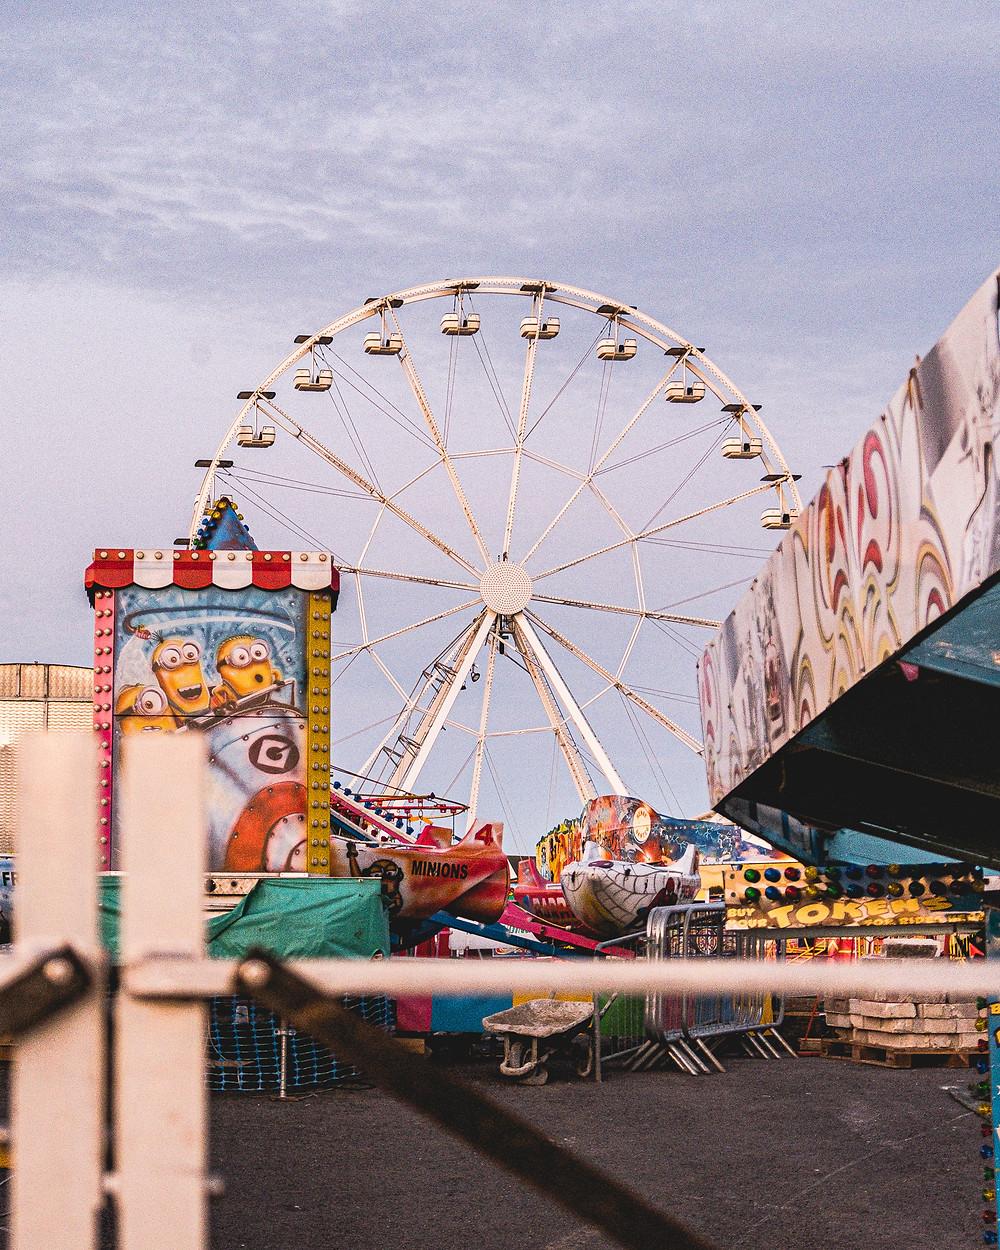 Barry Island Fair Ground South Wales